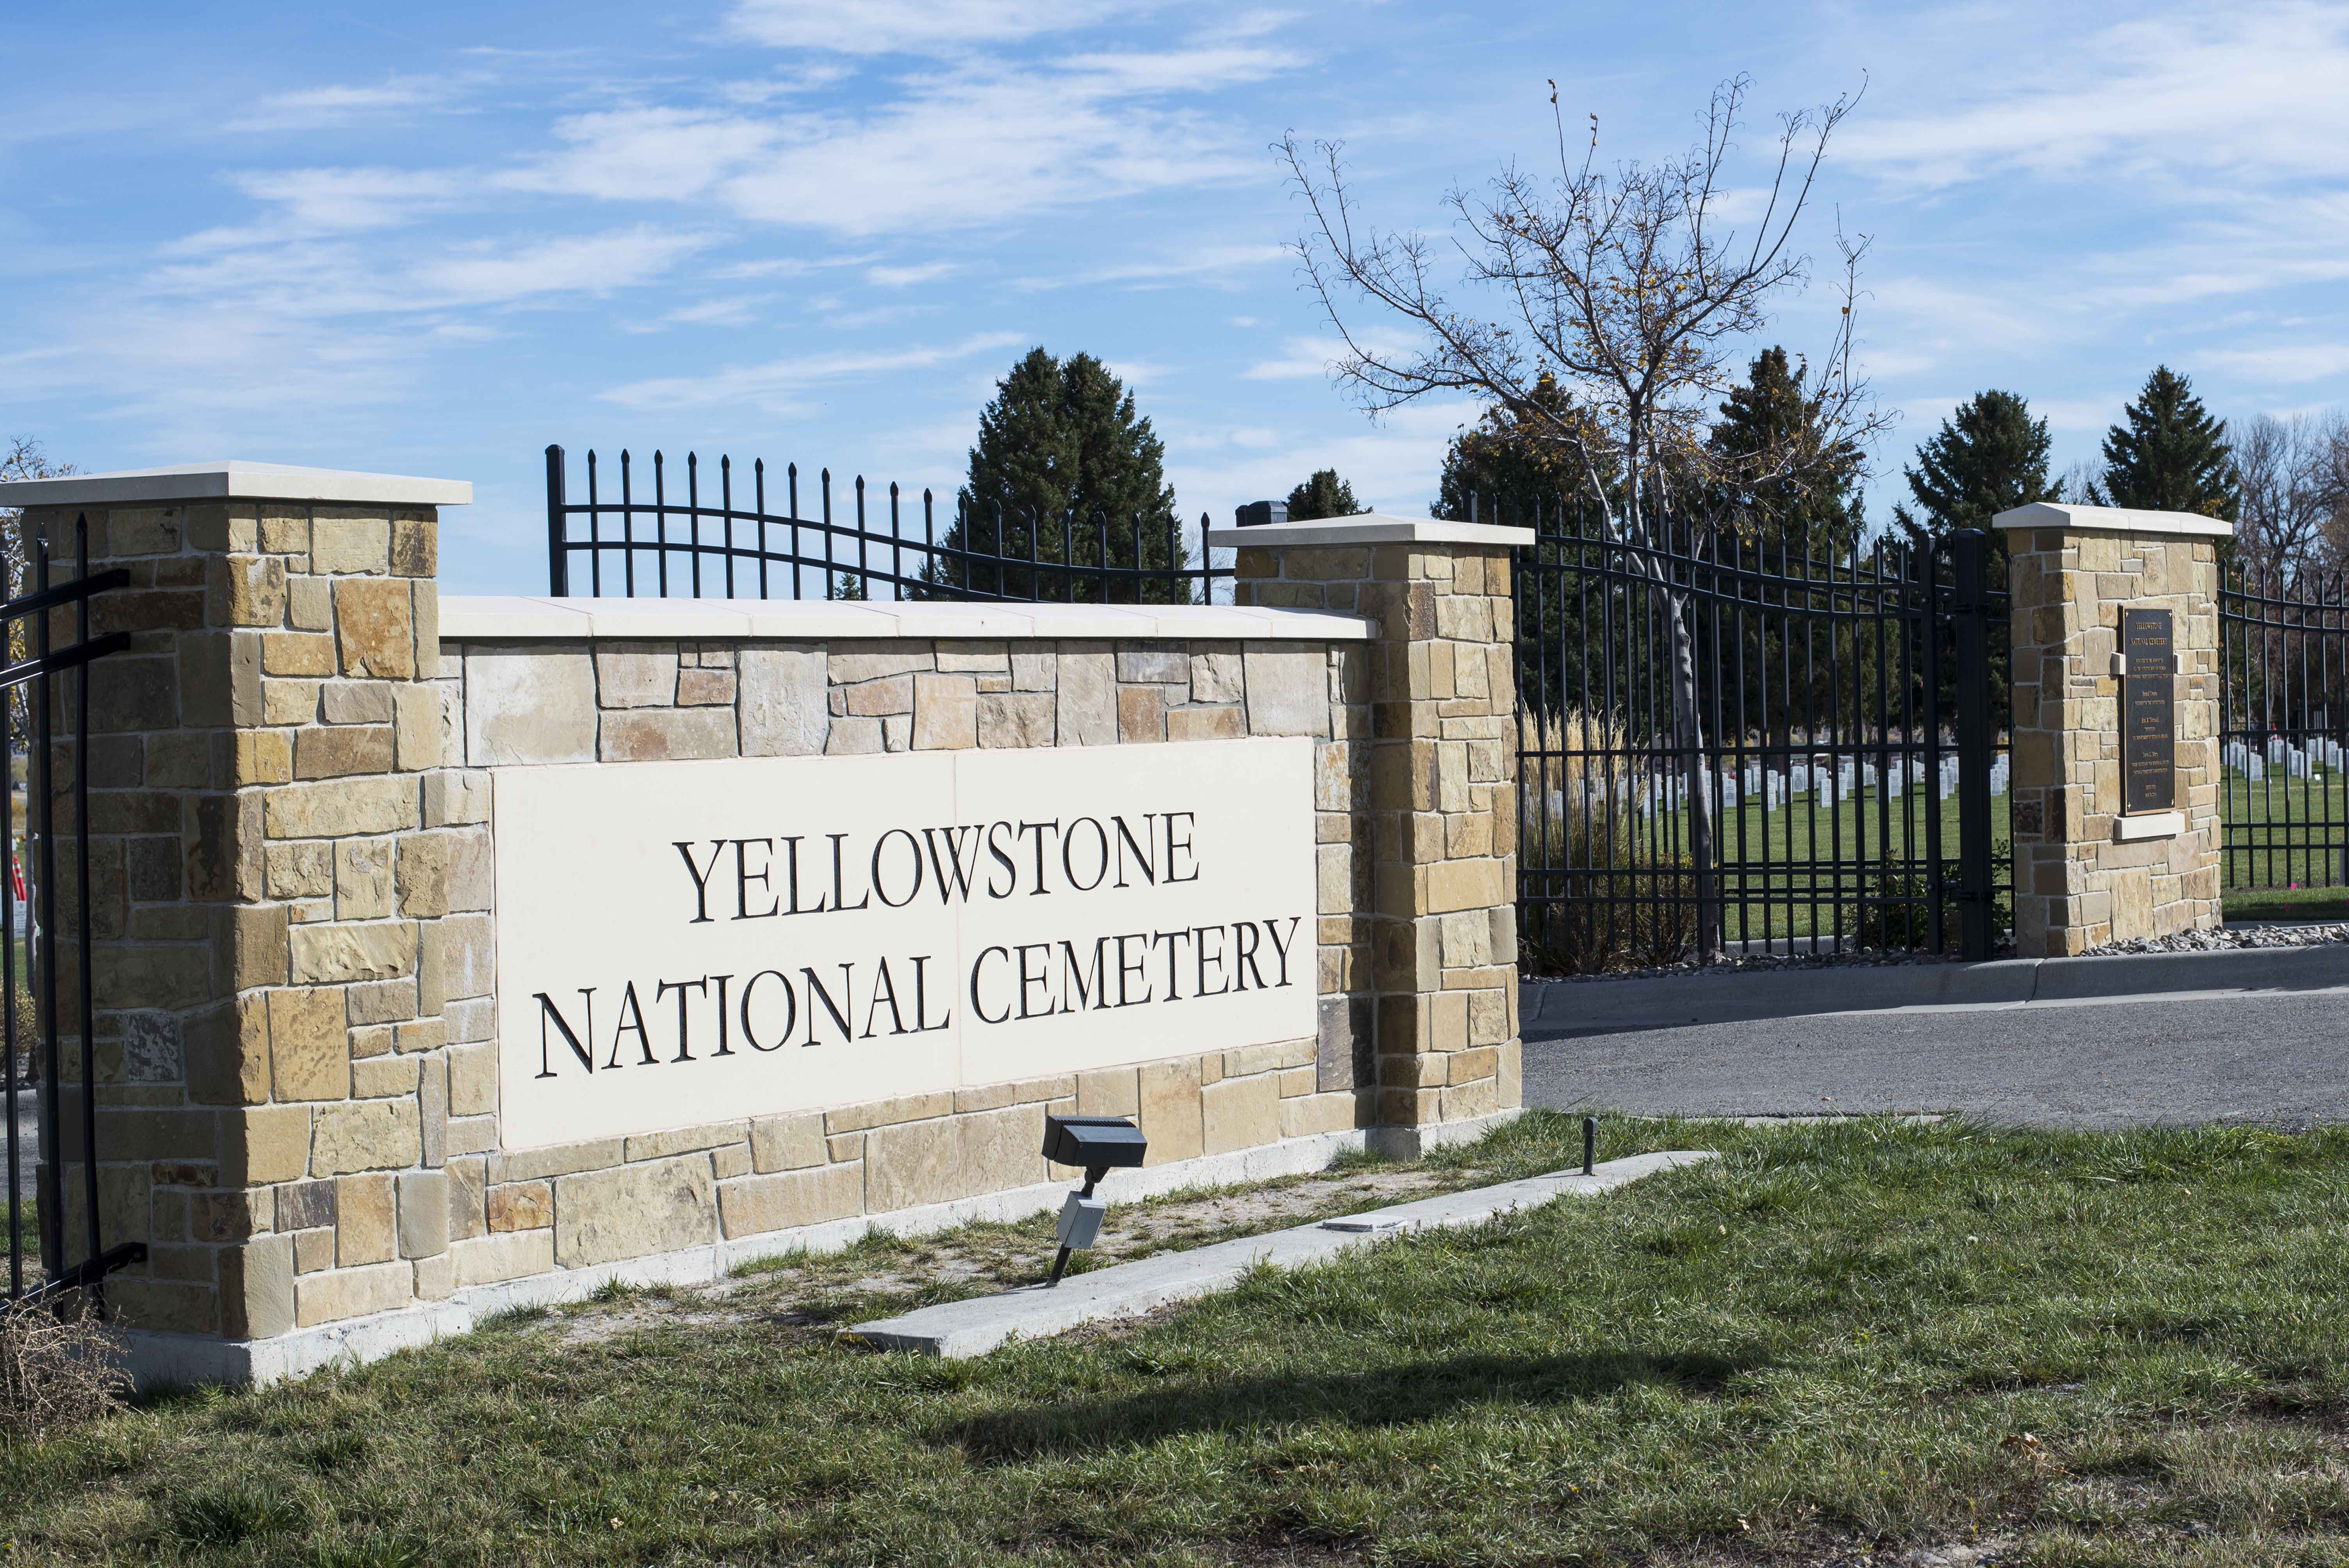 Yellowstone National Cemetery